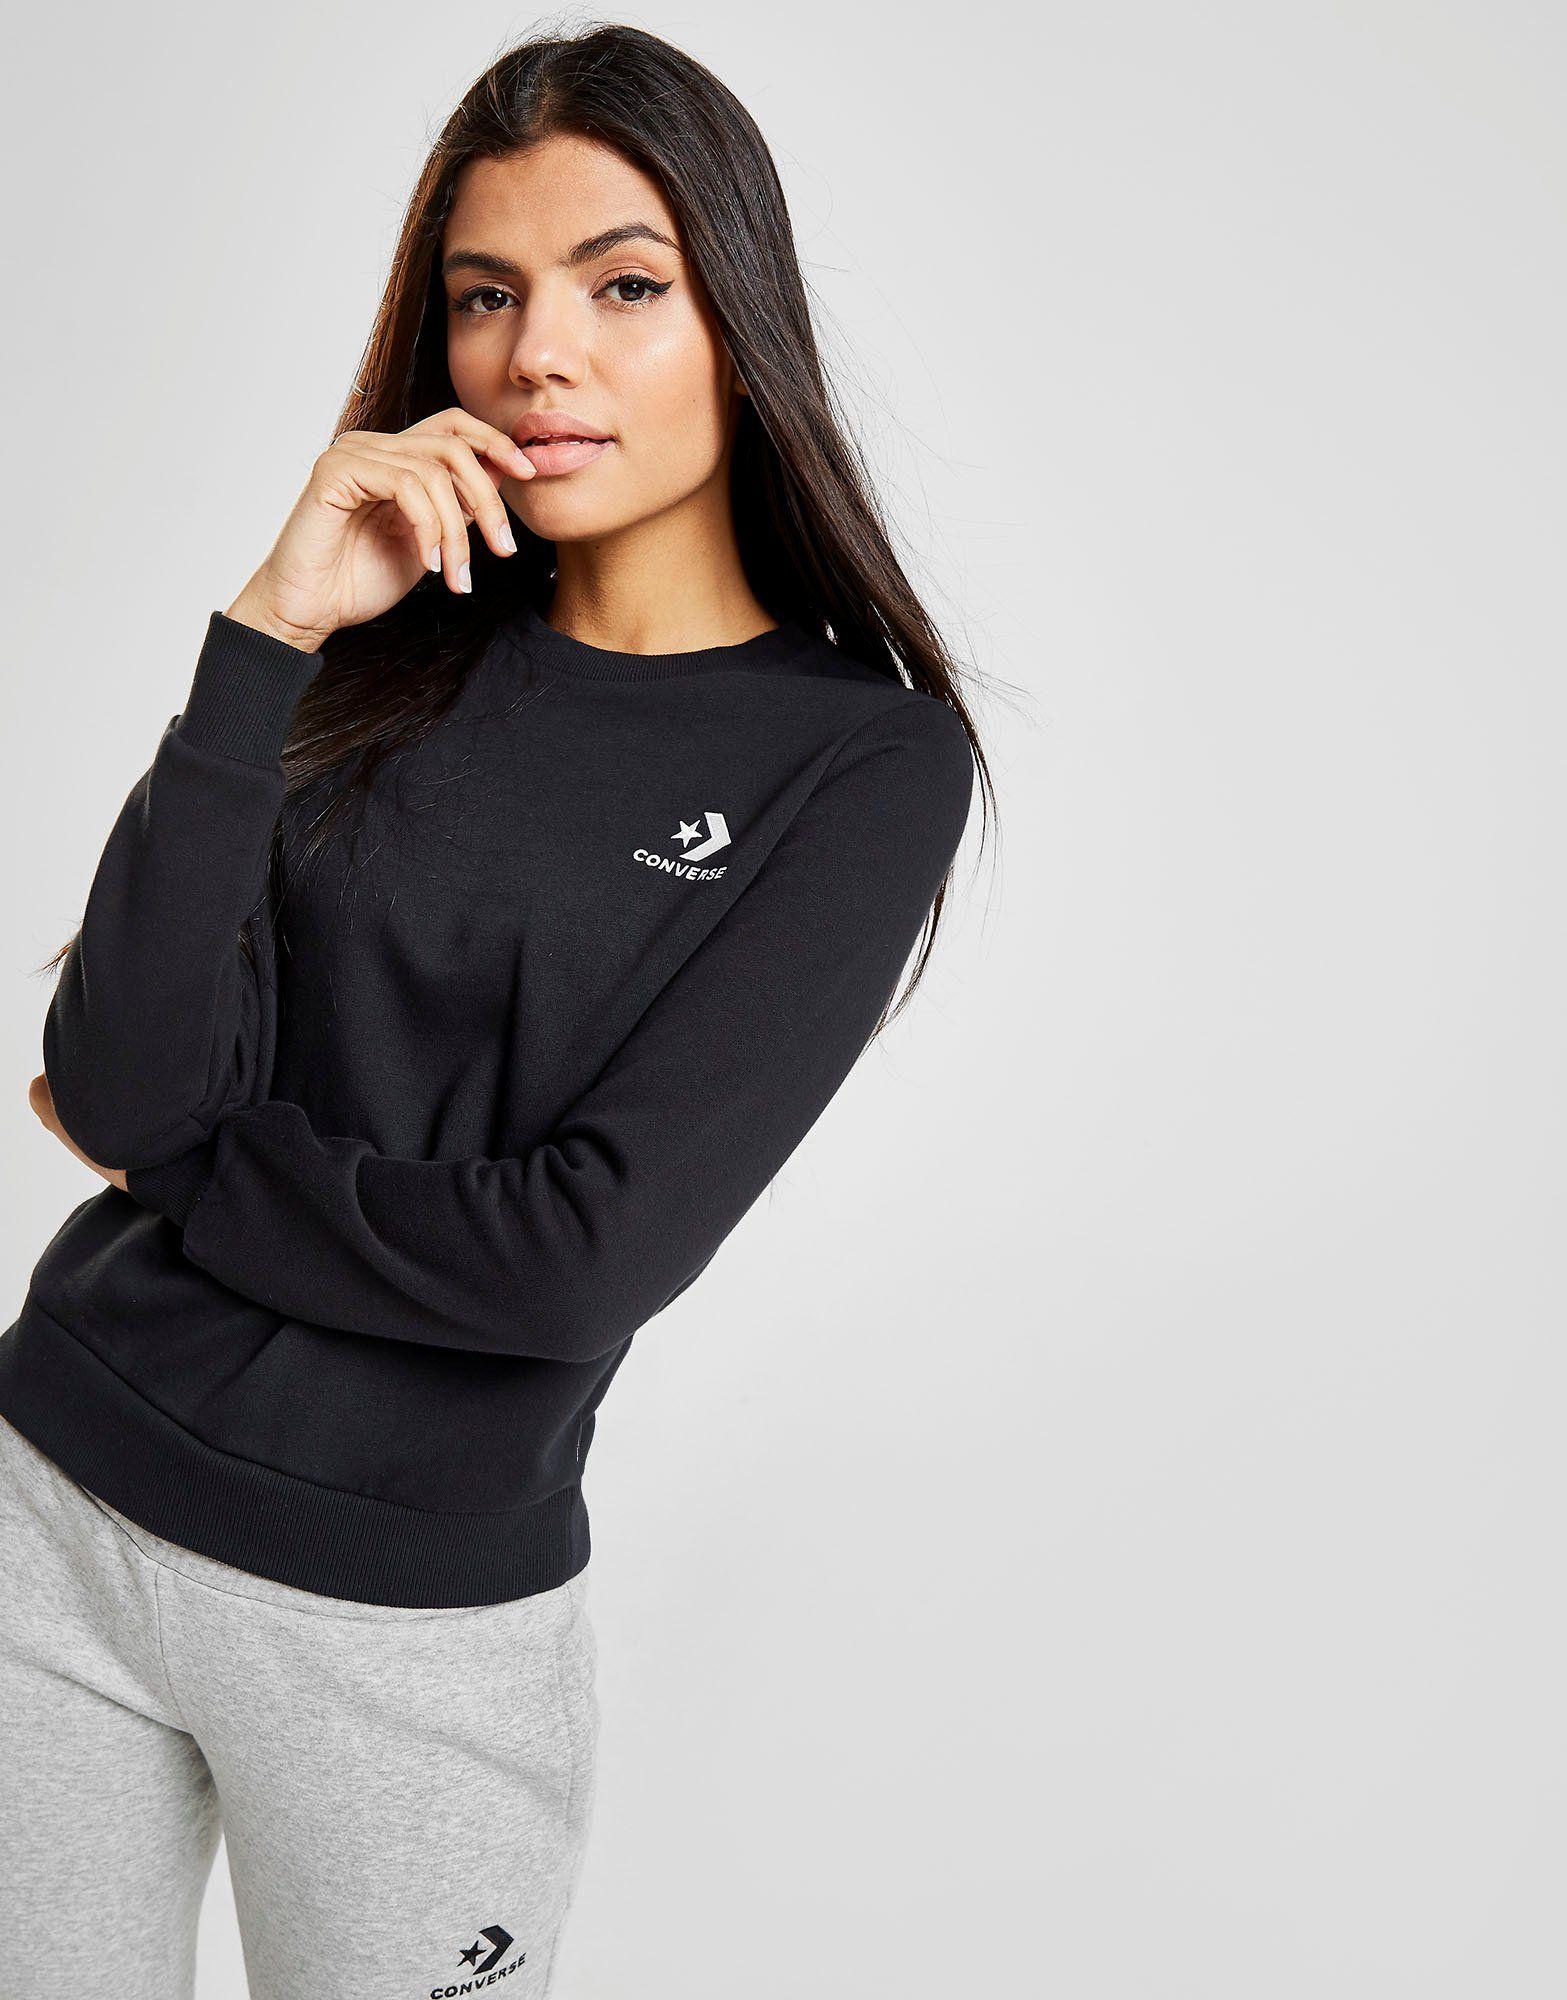 Converse Star Chevron Crew Sweatshirt